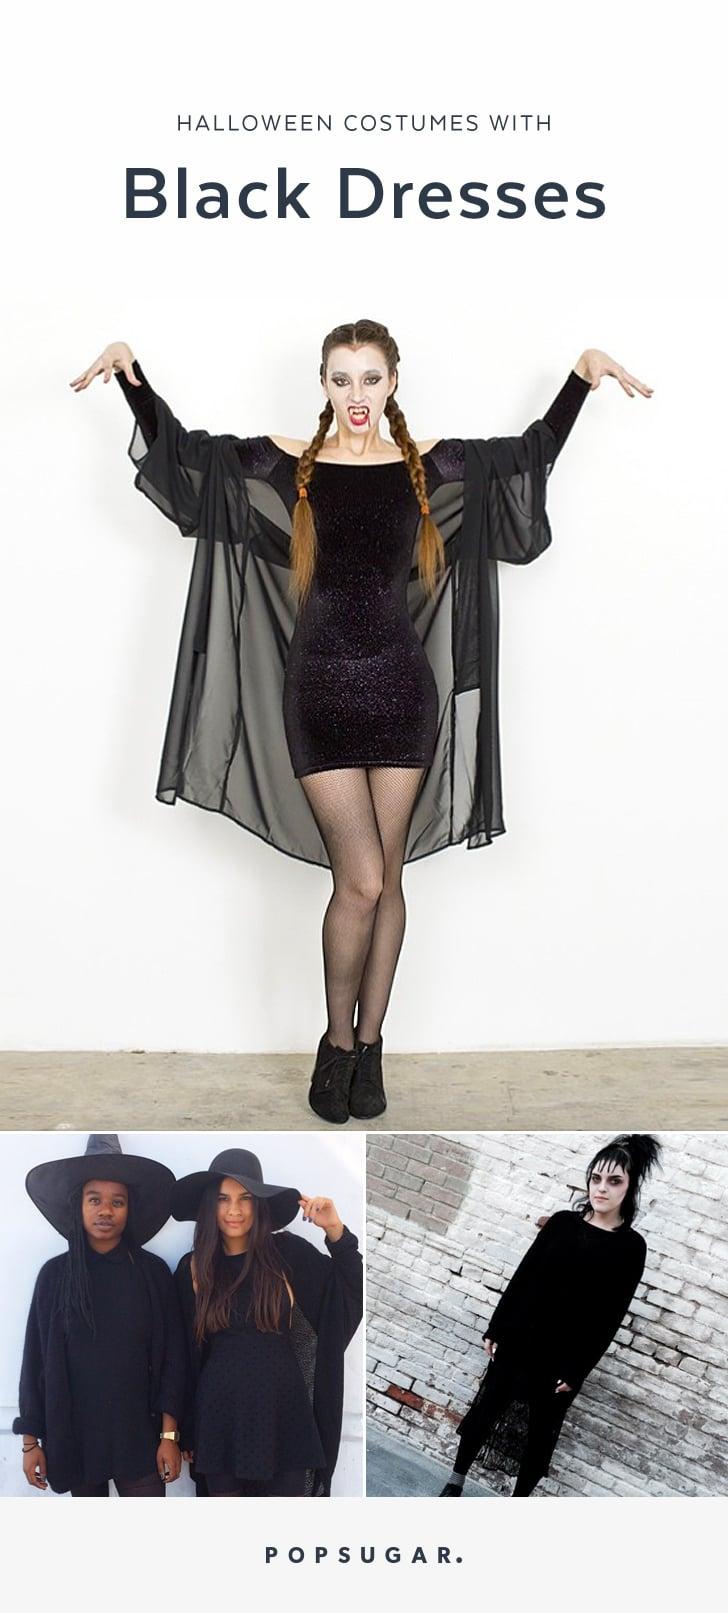 Black Dress Halloween Costumes | POPSUGAR Smart Living